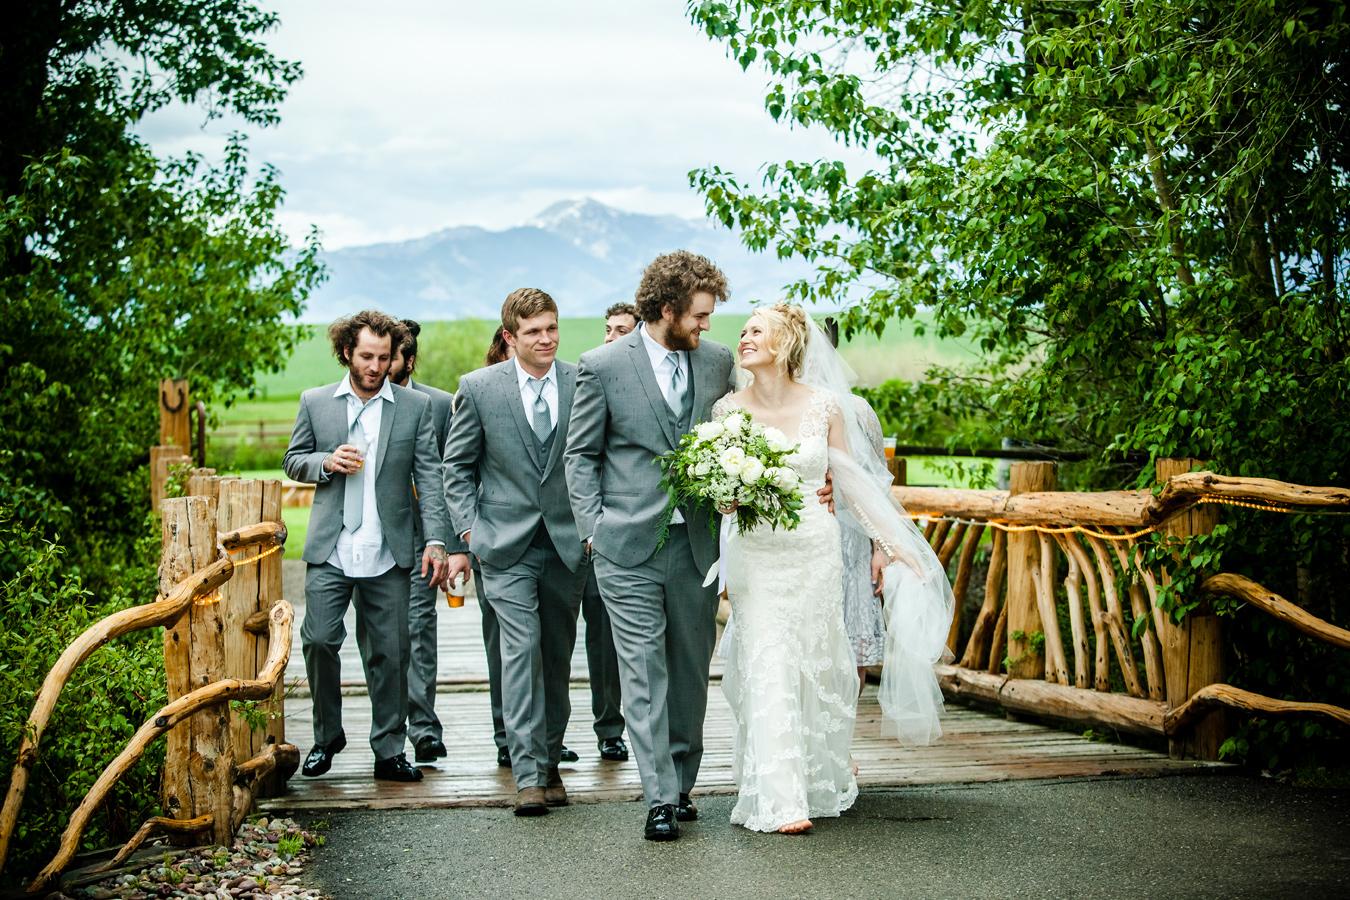 rockin tj wedding / photography Braden Tenney